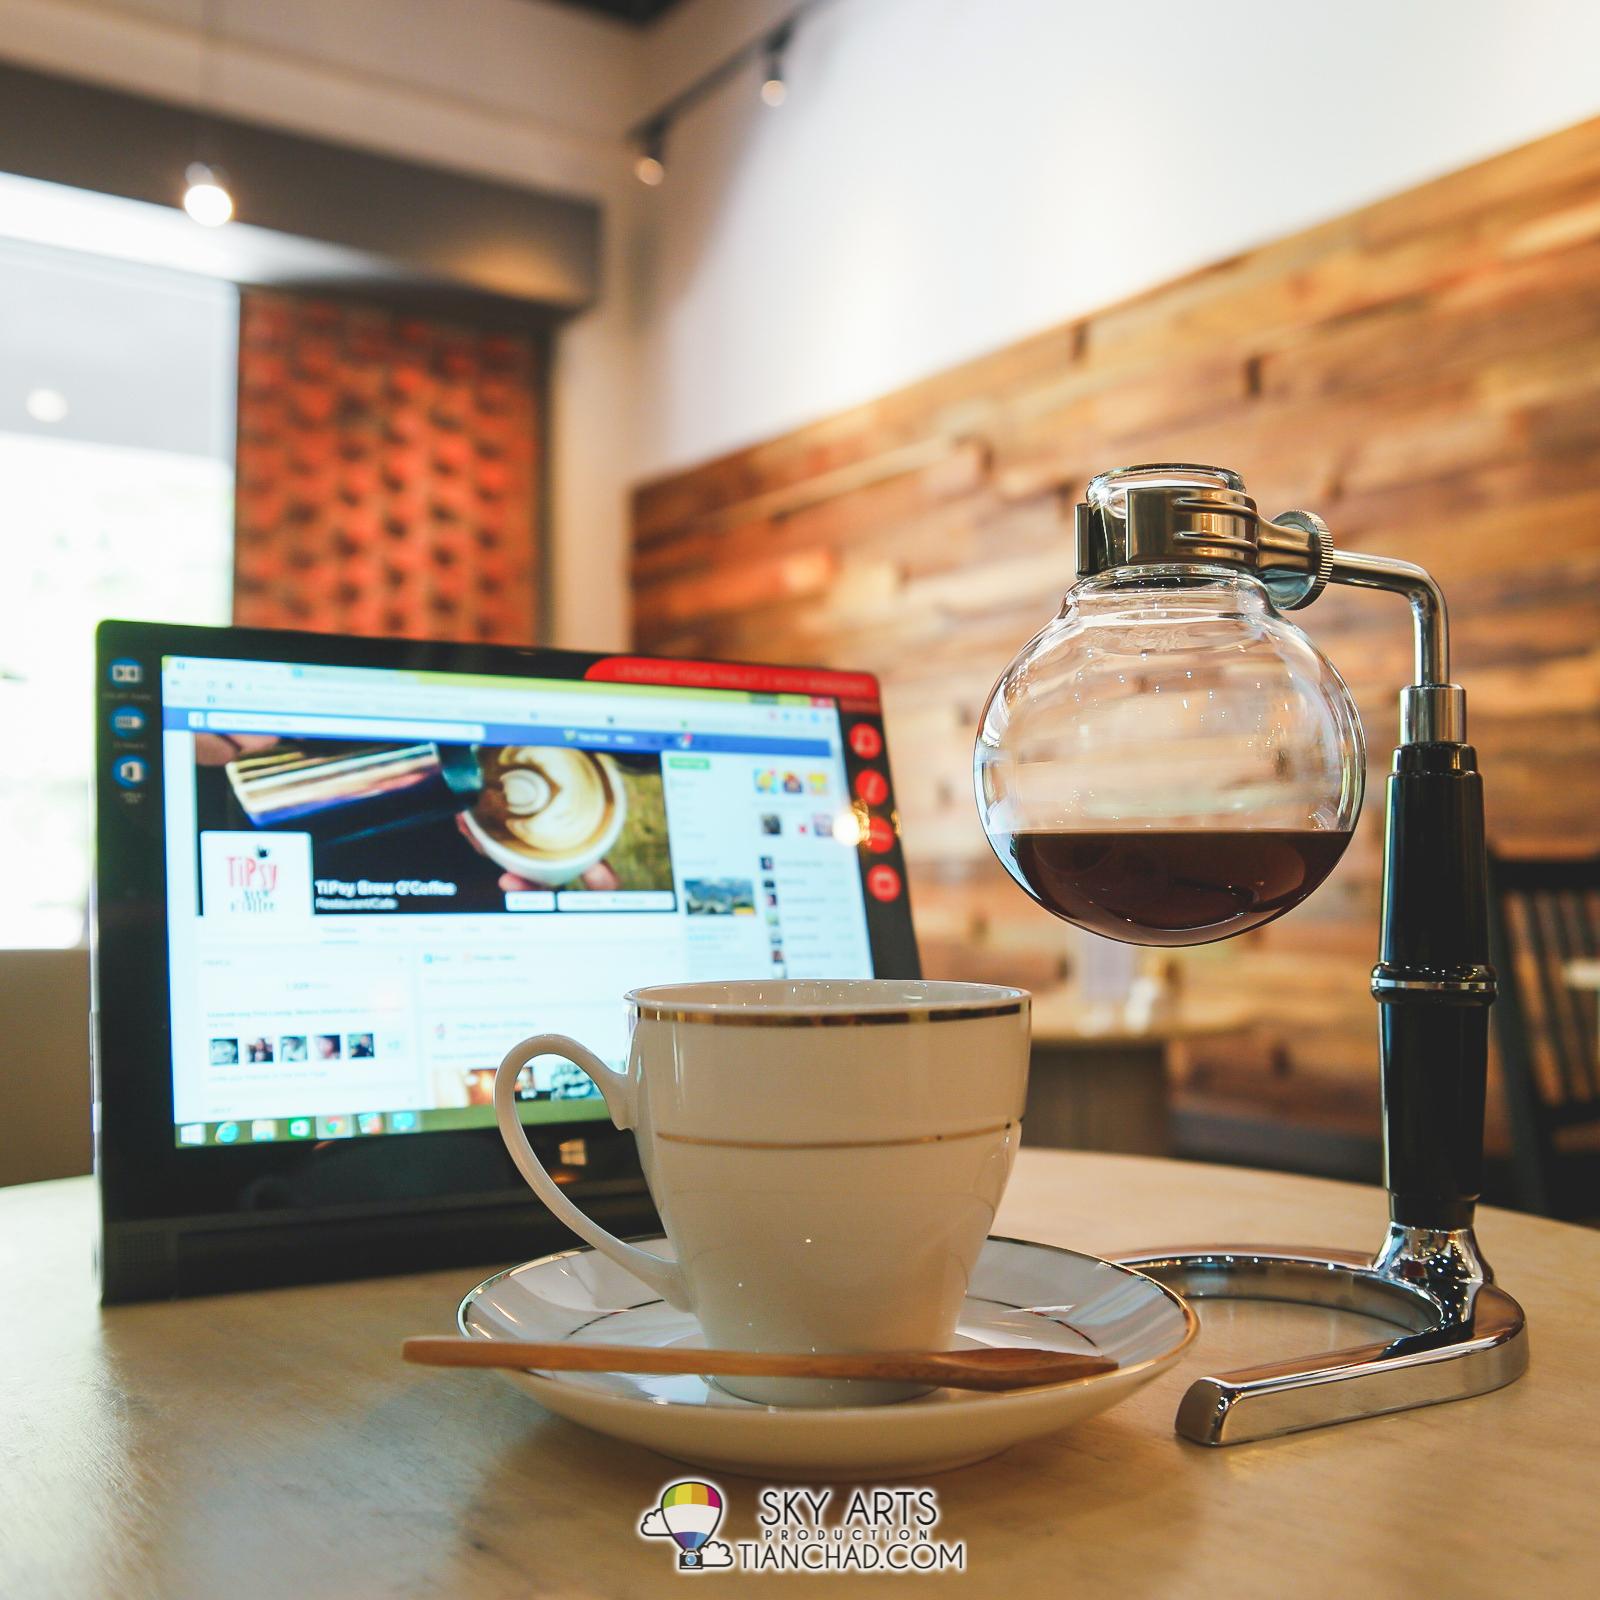 Ethiopia Kochere - An interesting coffee to order